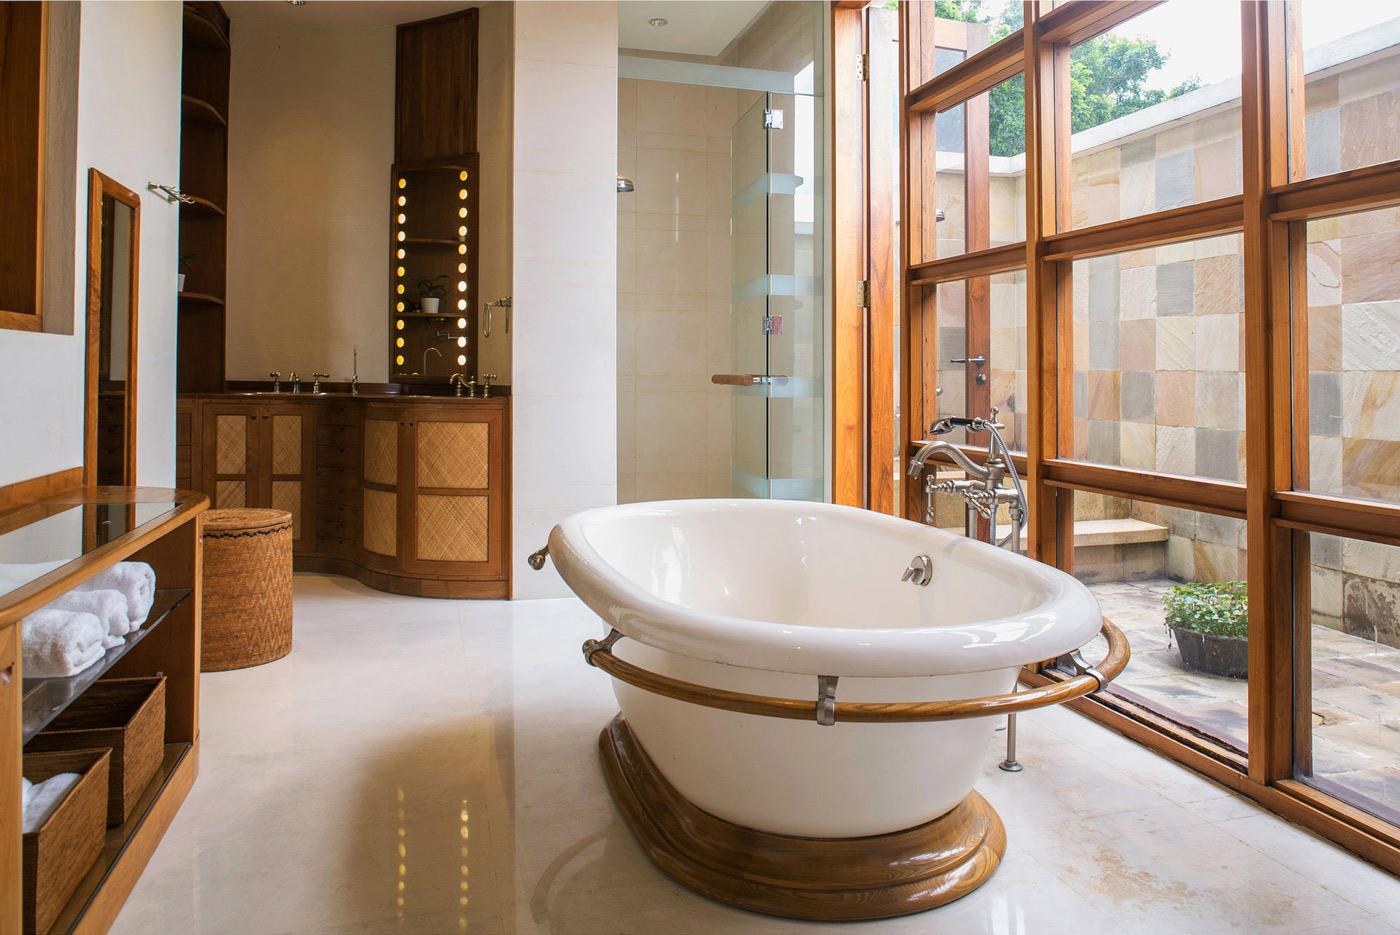 Bathroom, Glass Shower, Sinks, Home in Kuala Lumpur, Malaysia